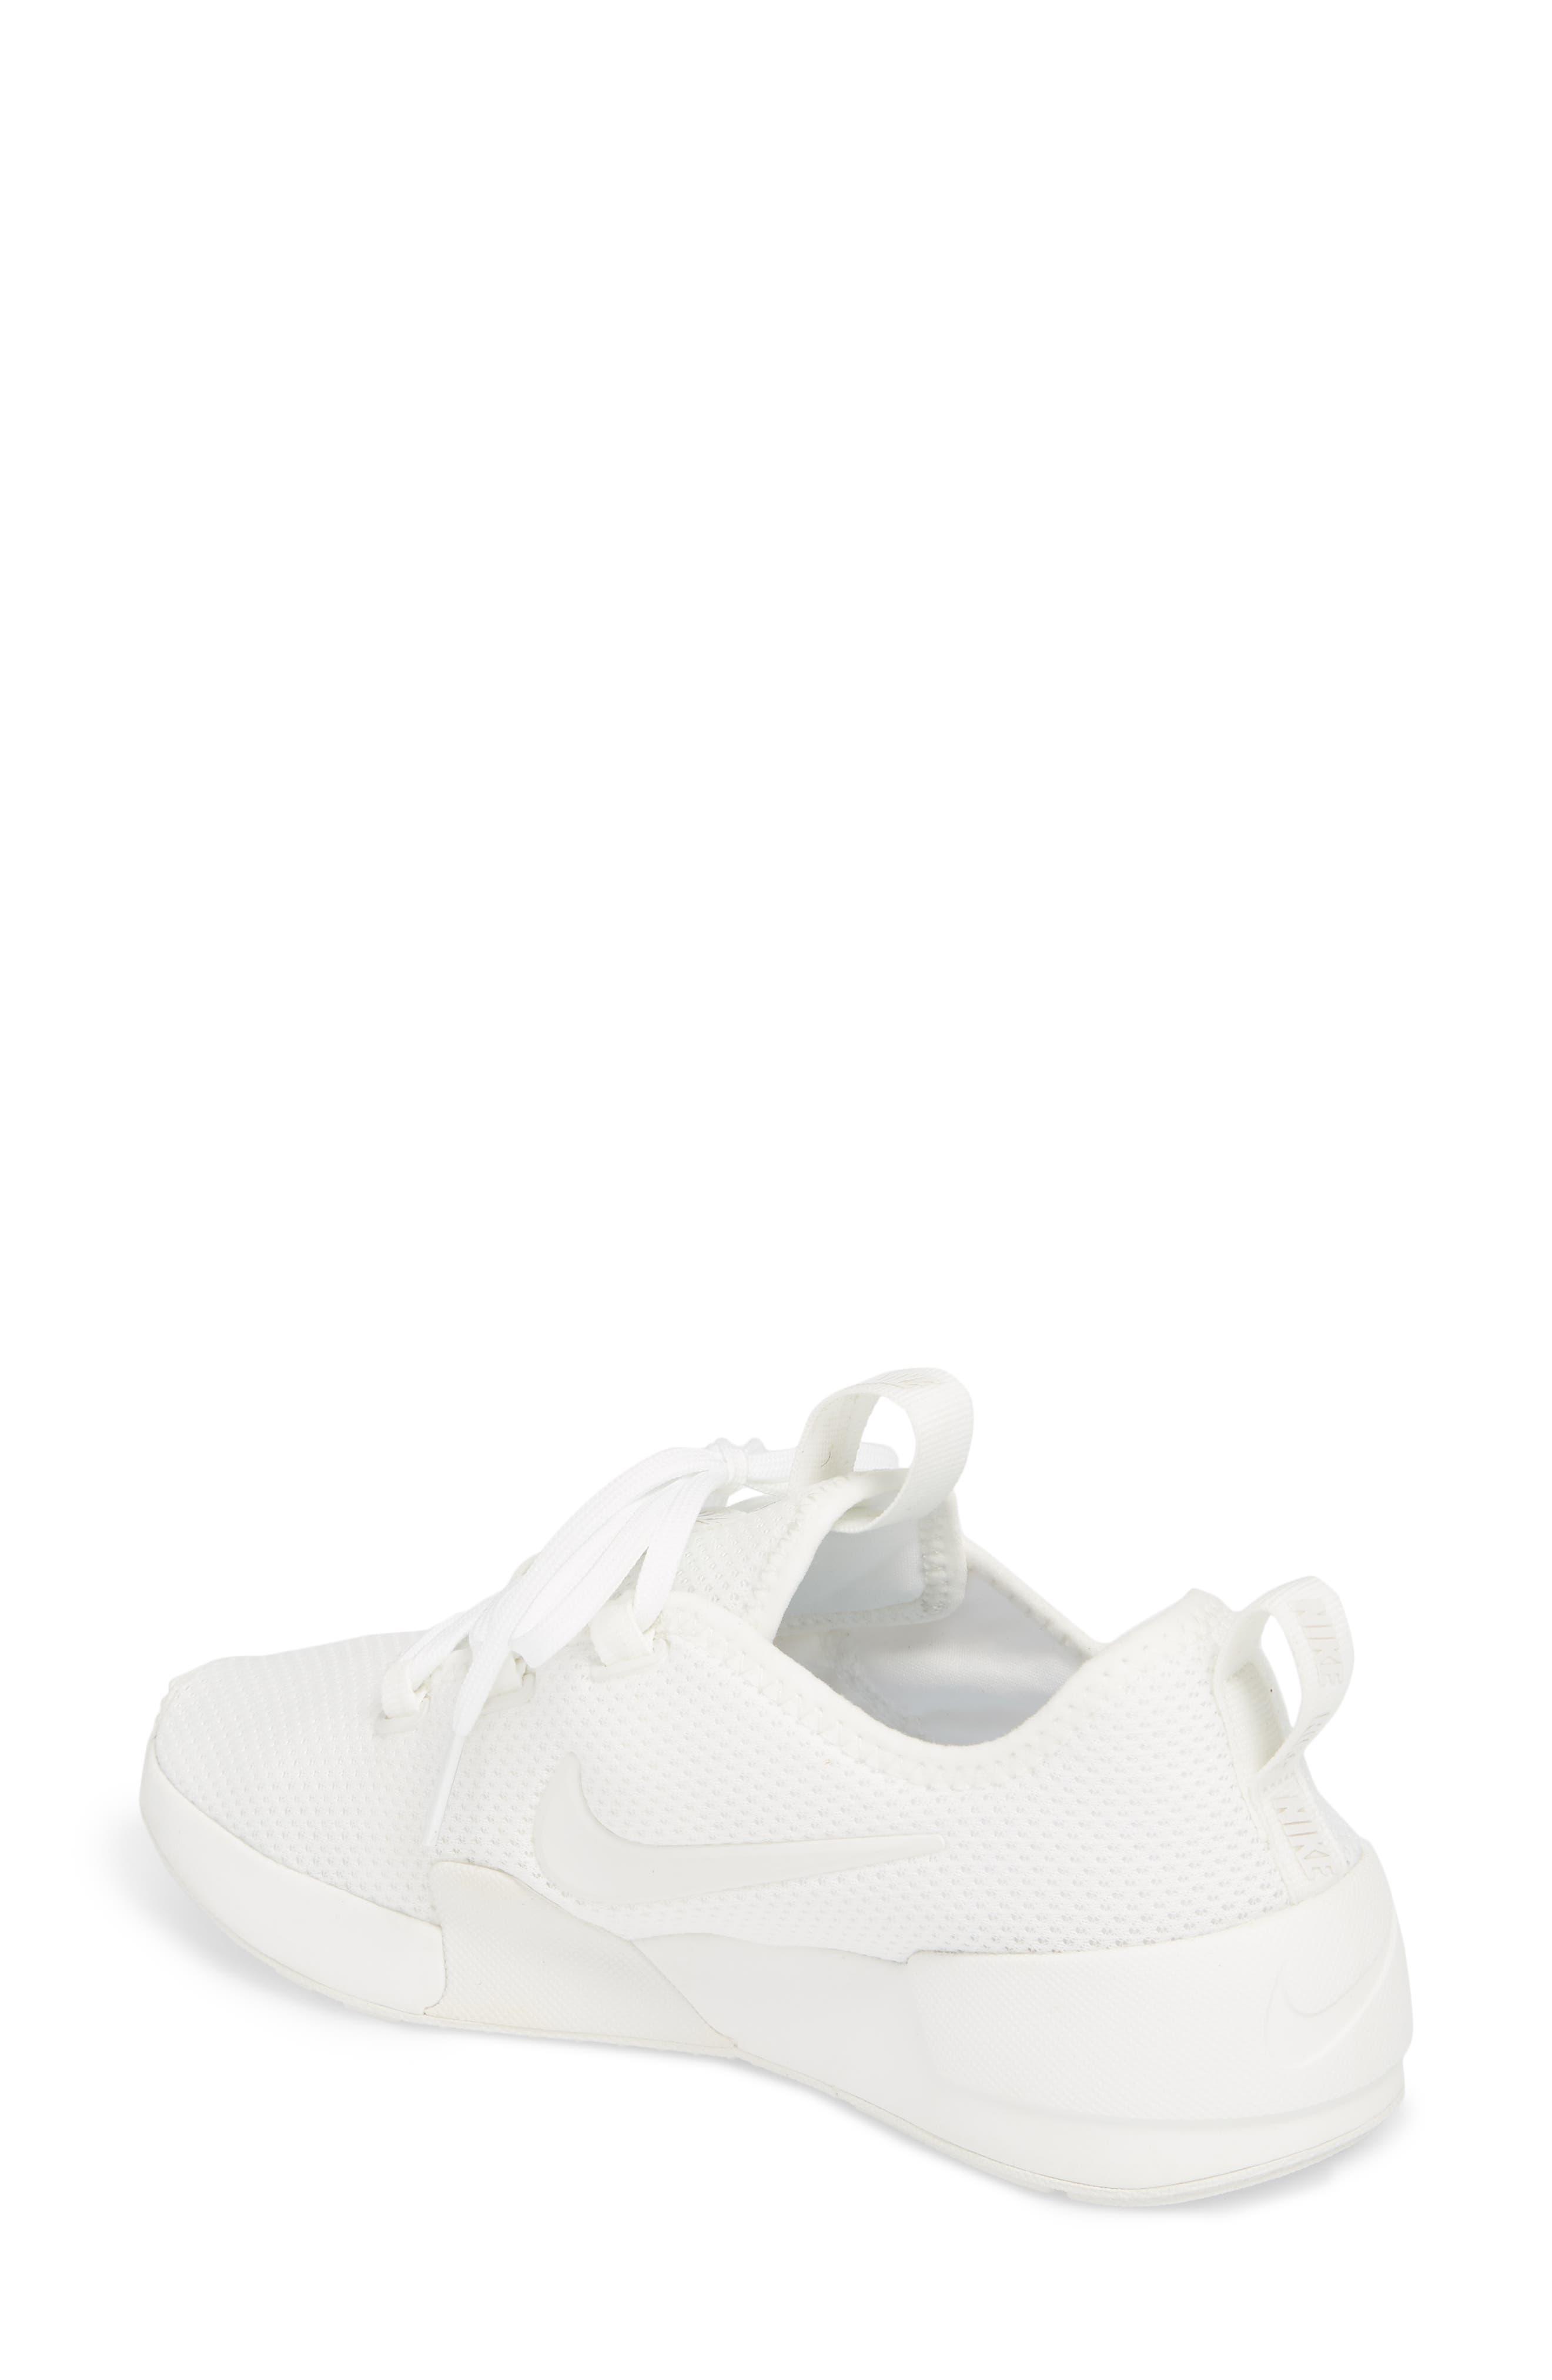 Ashin Modern Shoe,                             Alternate thumbnail 2, color,                             Summit White